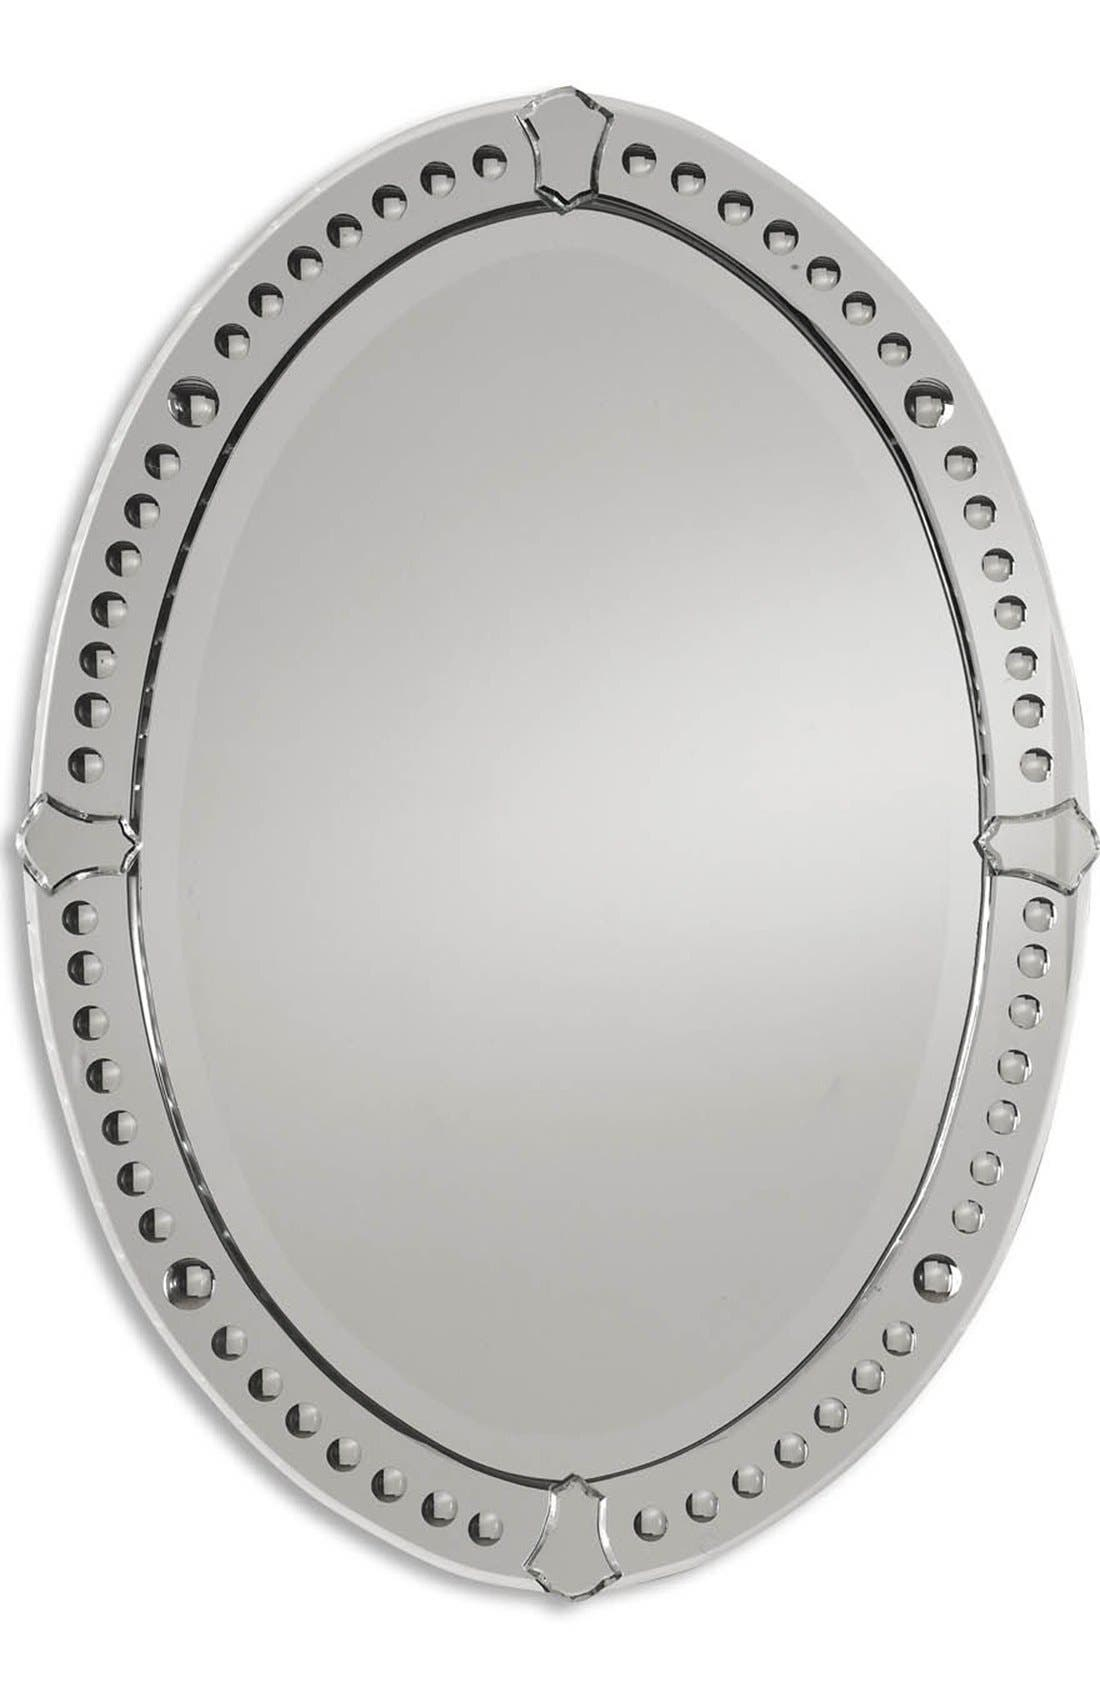 'Graziano' Frameless Oval Mirror,                             Main thumbnail 1, color,                             200